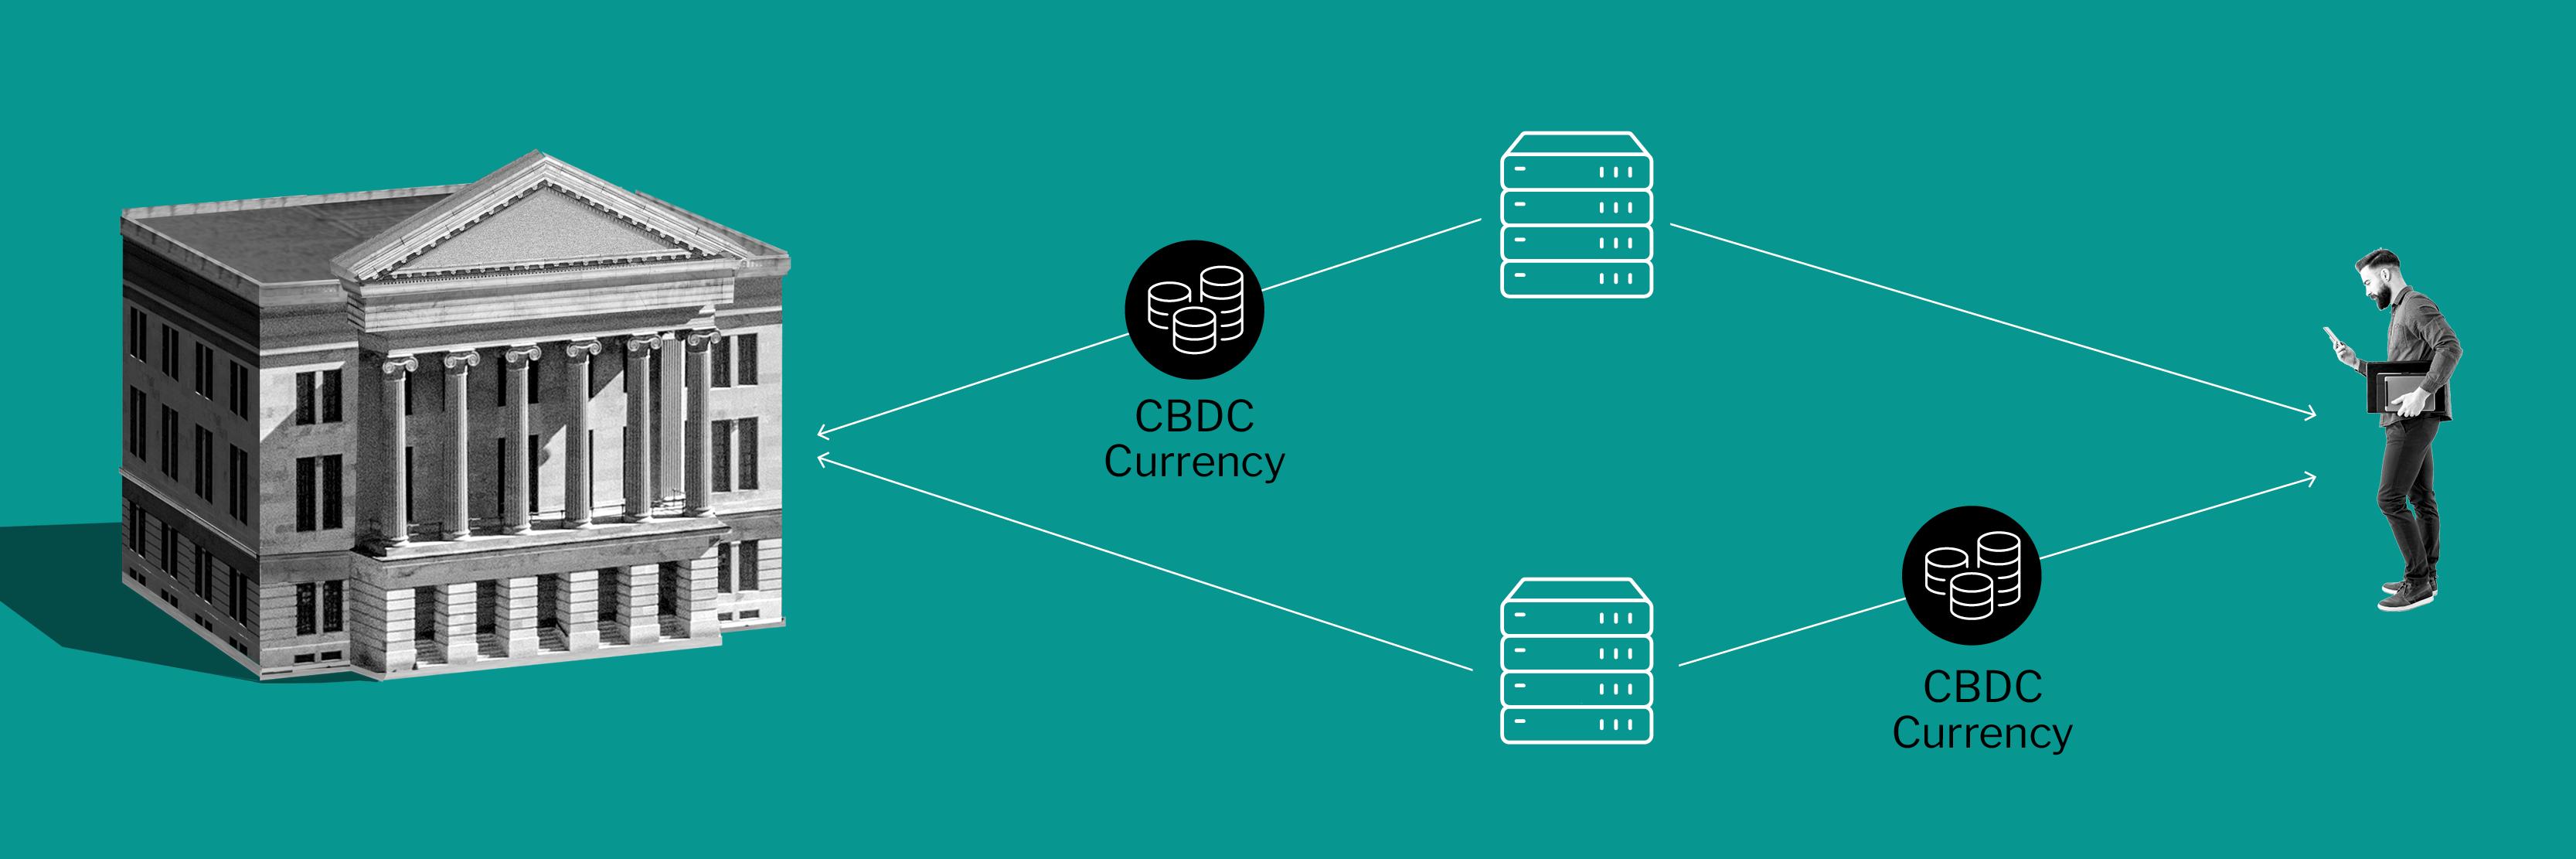 Illustration depicting a hybrid CBDC model